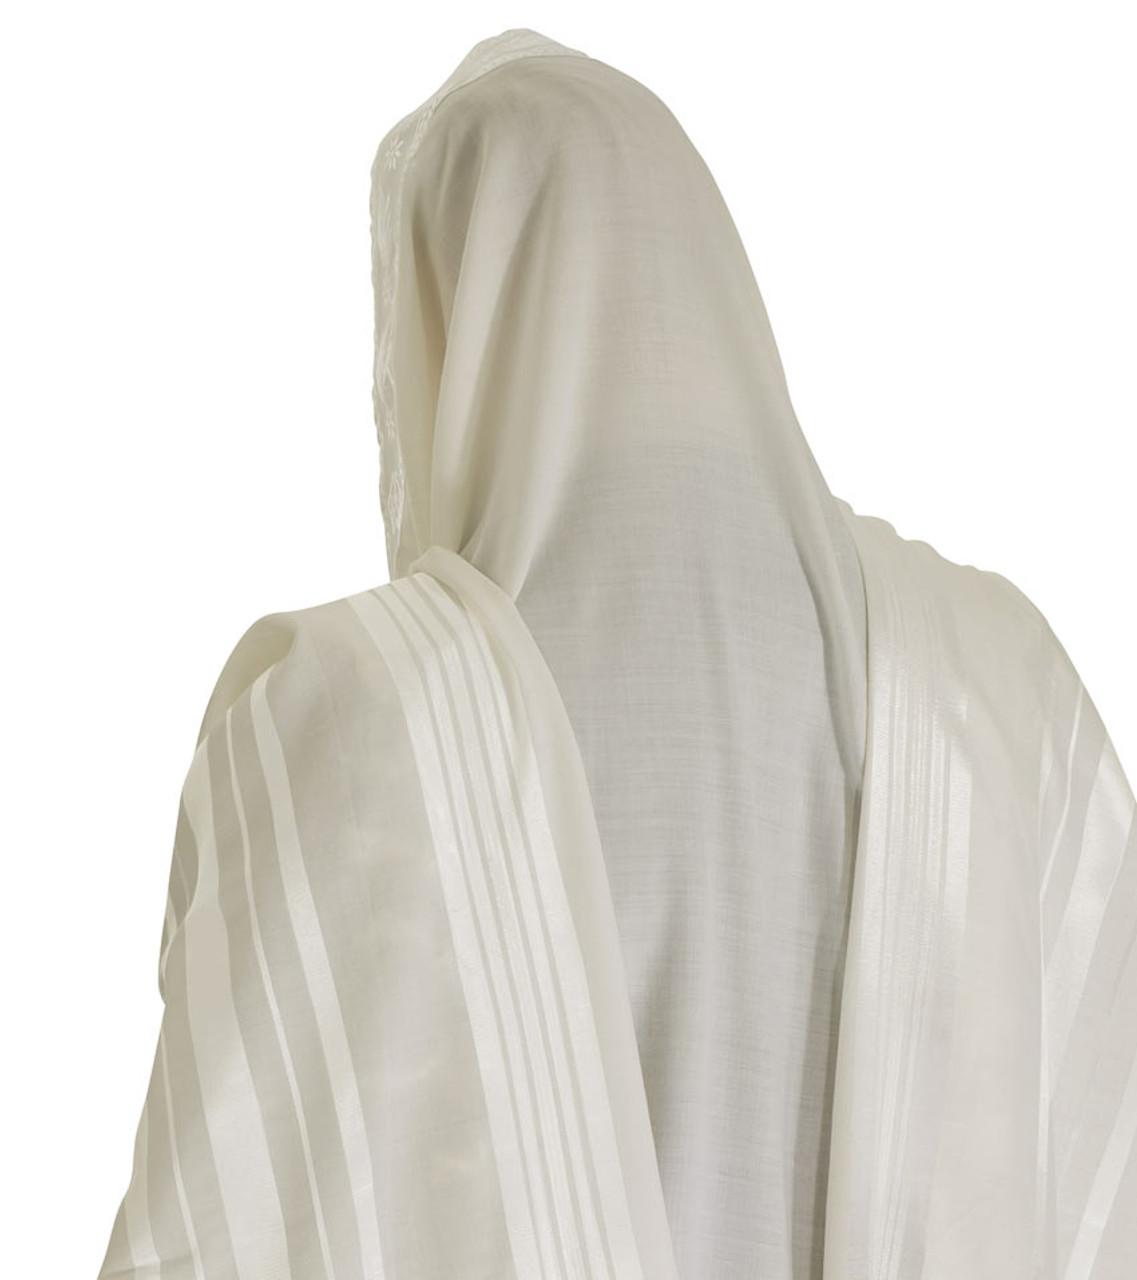 Prima A.A. White-Striped Tallit